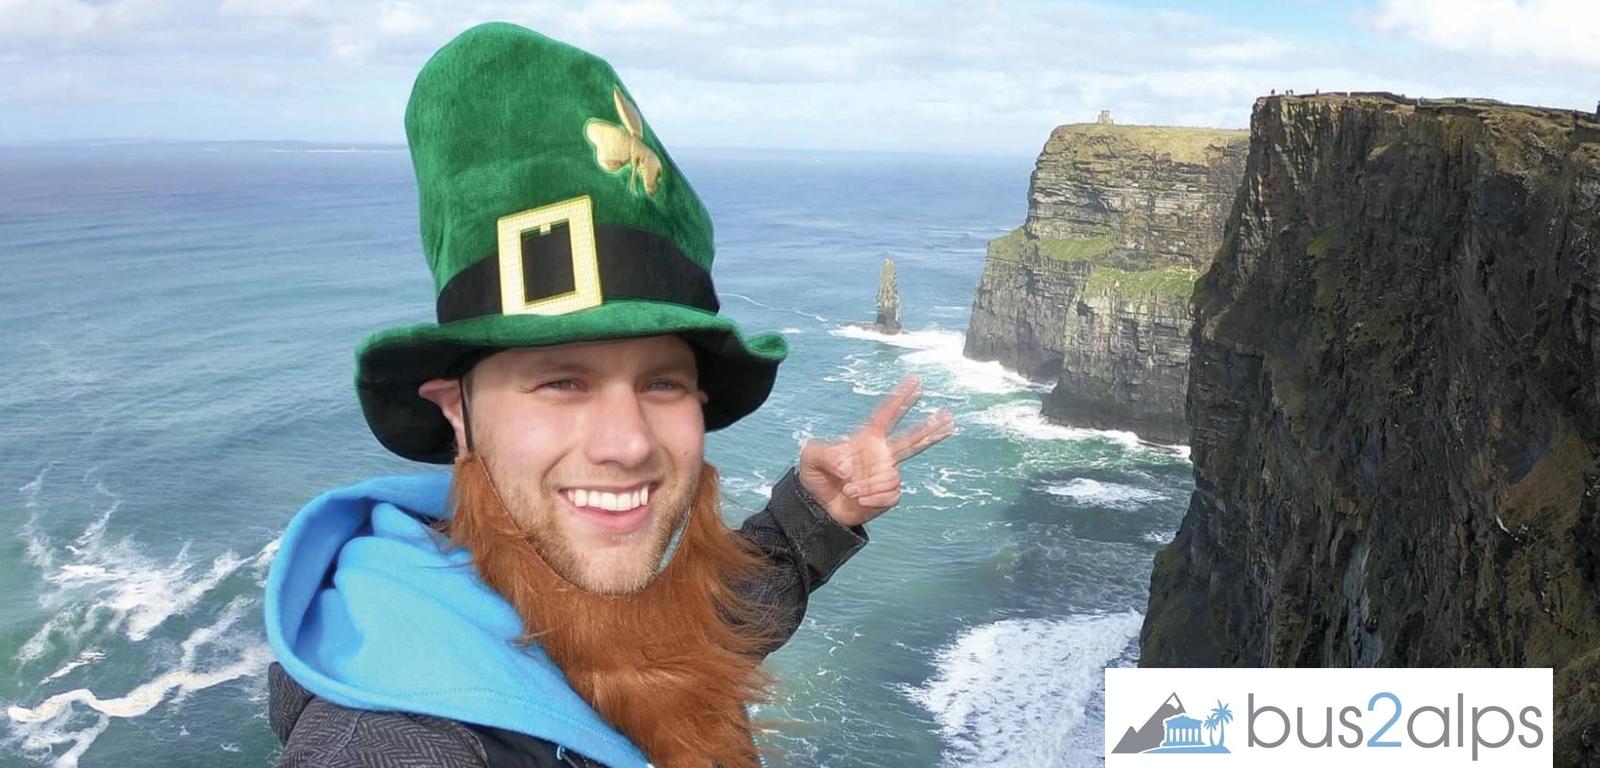 Promo code Campus Bus2alps Ireland St Patricks Day